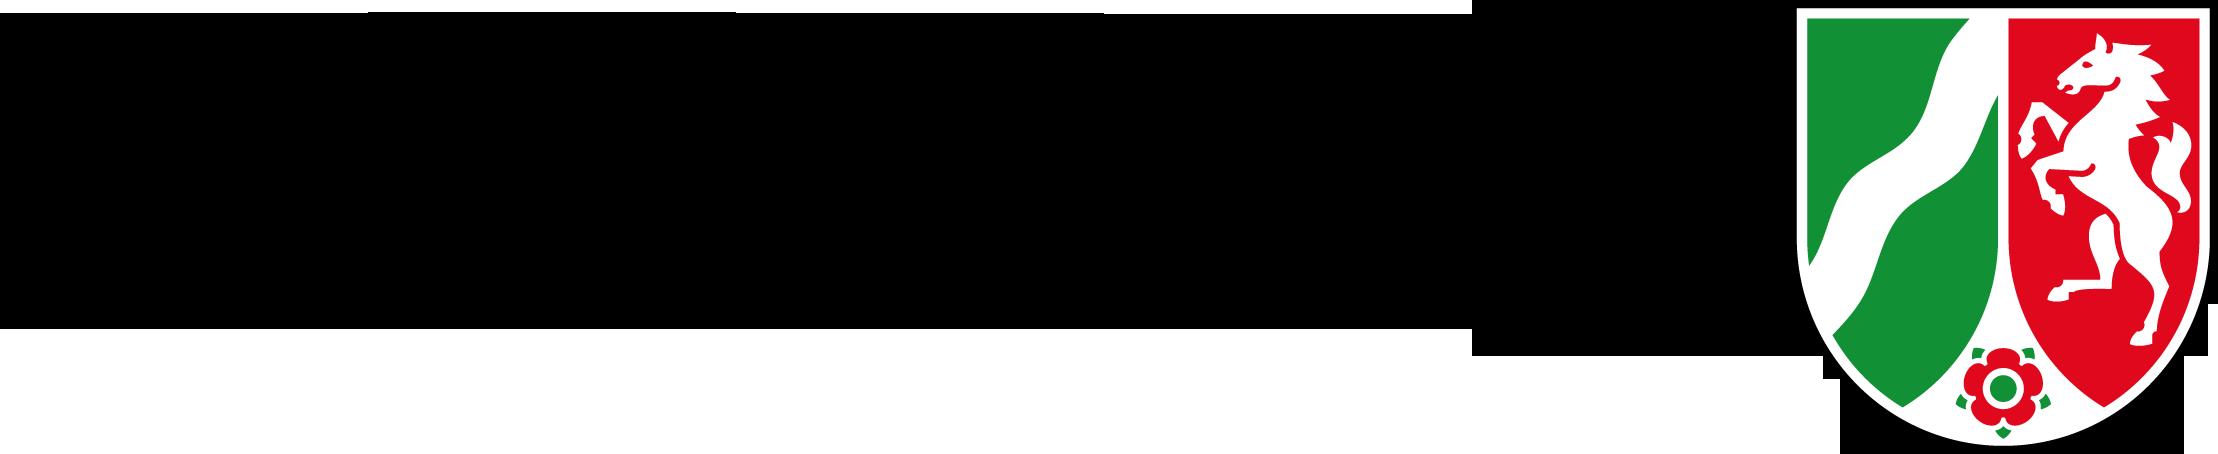 Logo MIWF NRW